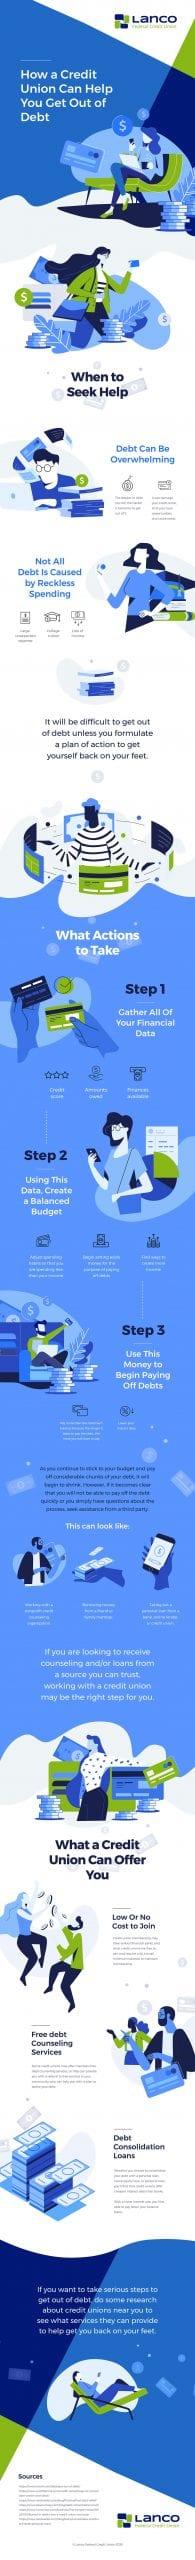 Lanco FCU infographic